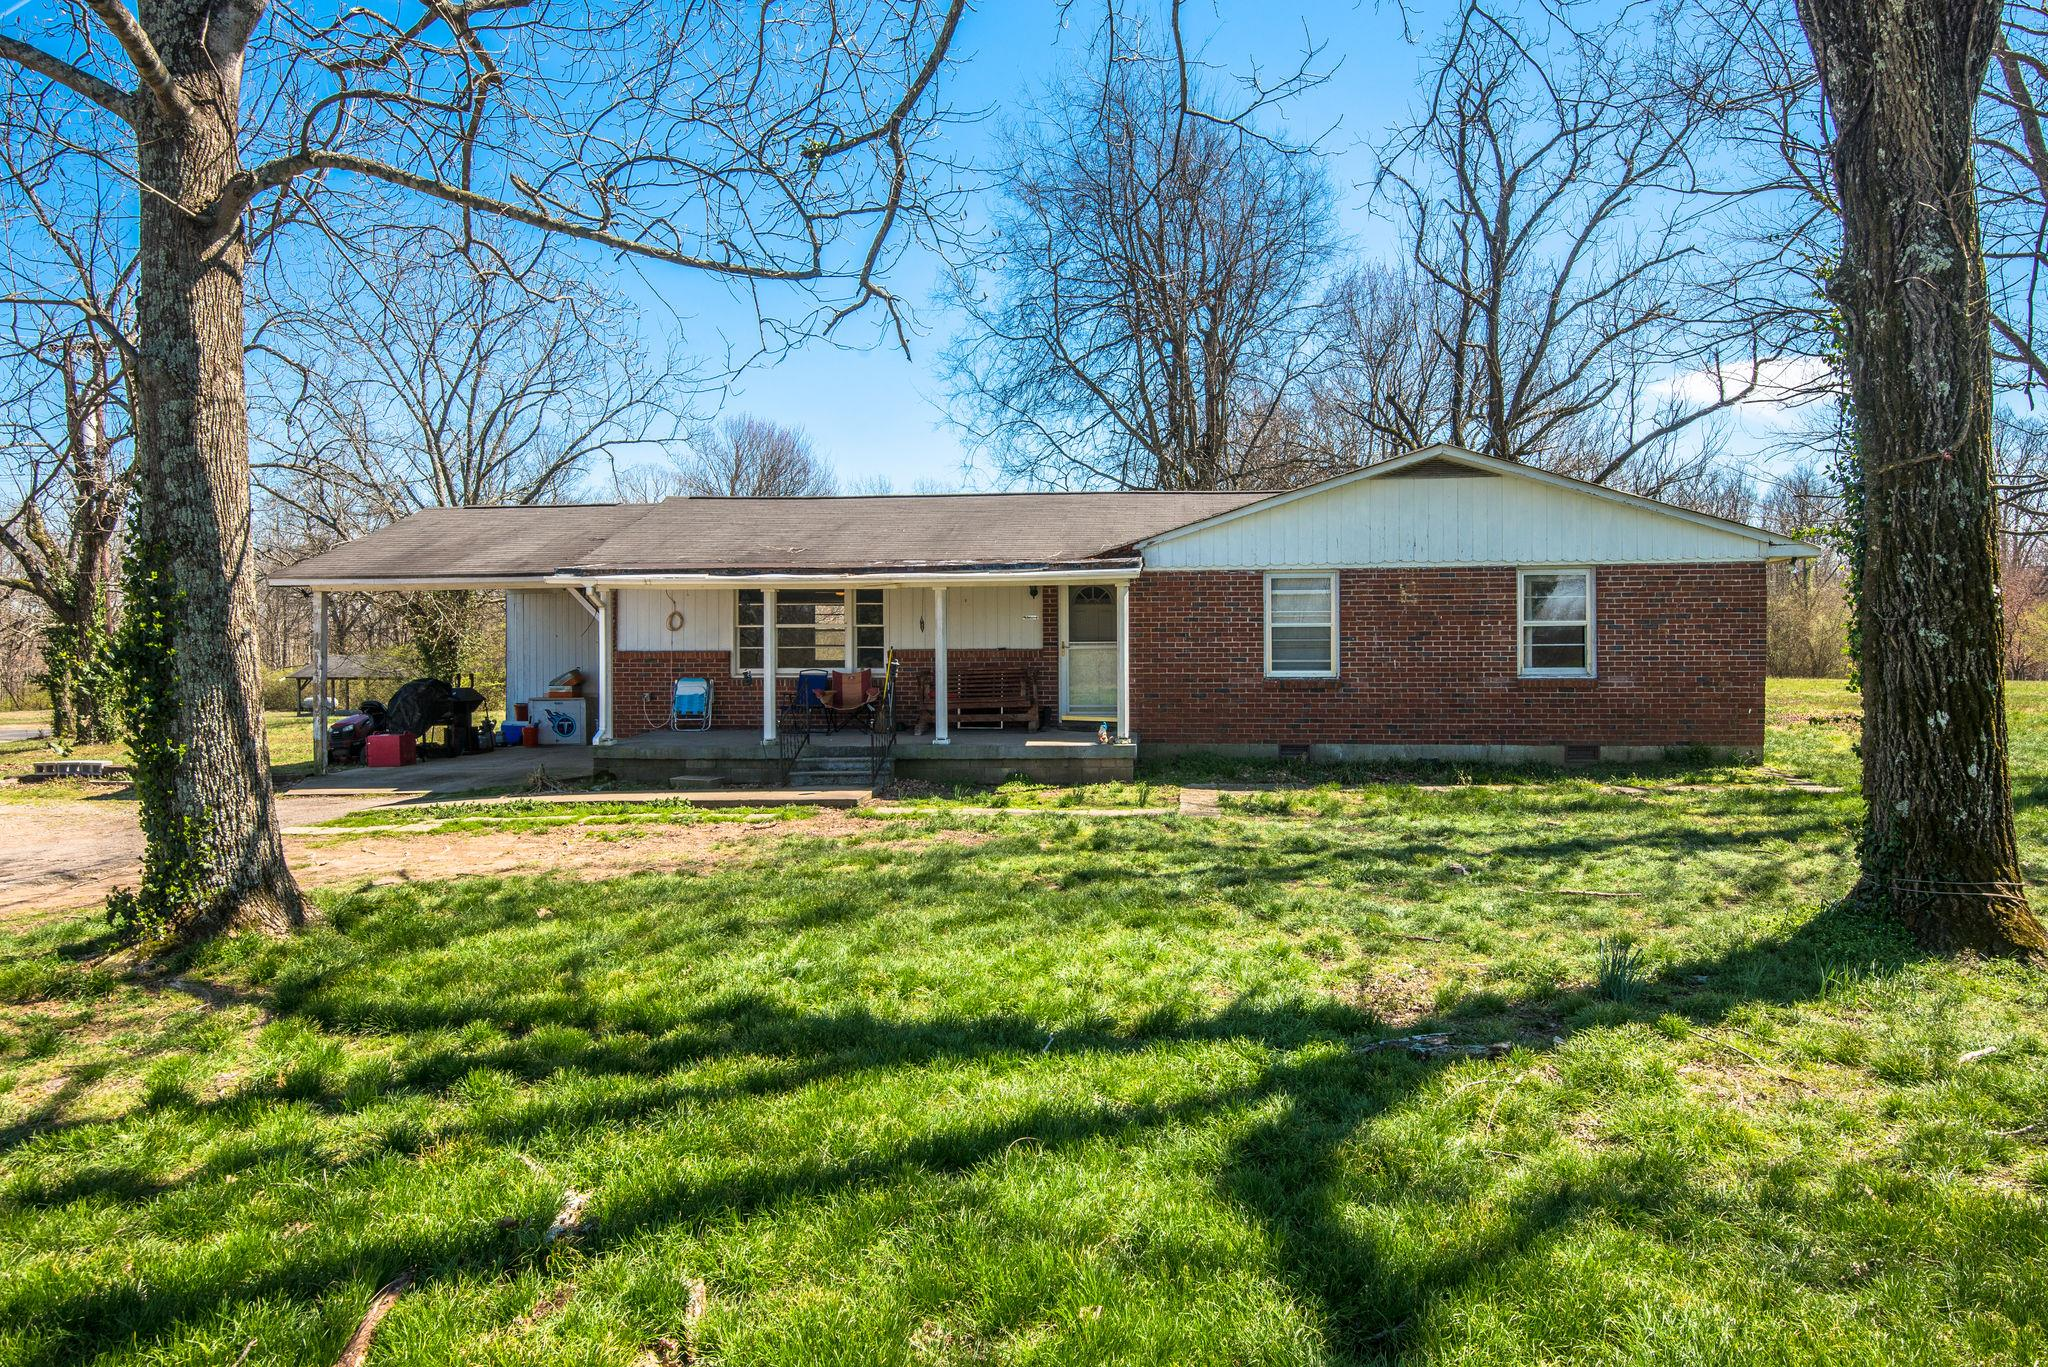 8671 Old Charlotte Pike Pegram, TN 37143